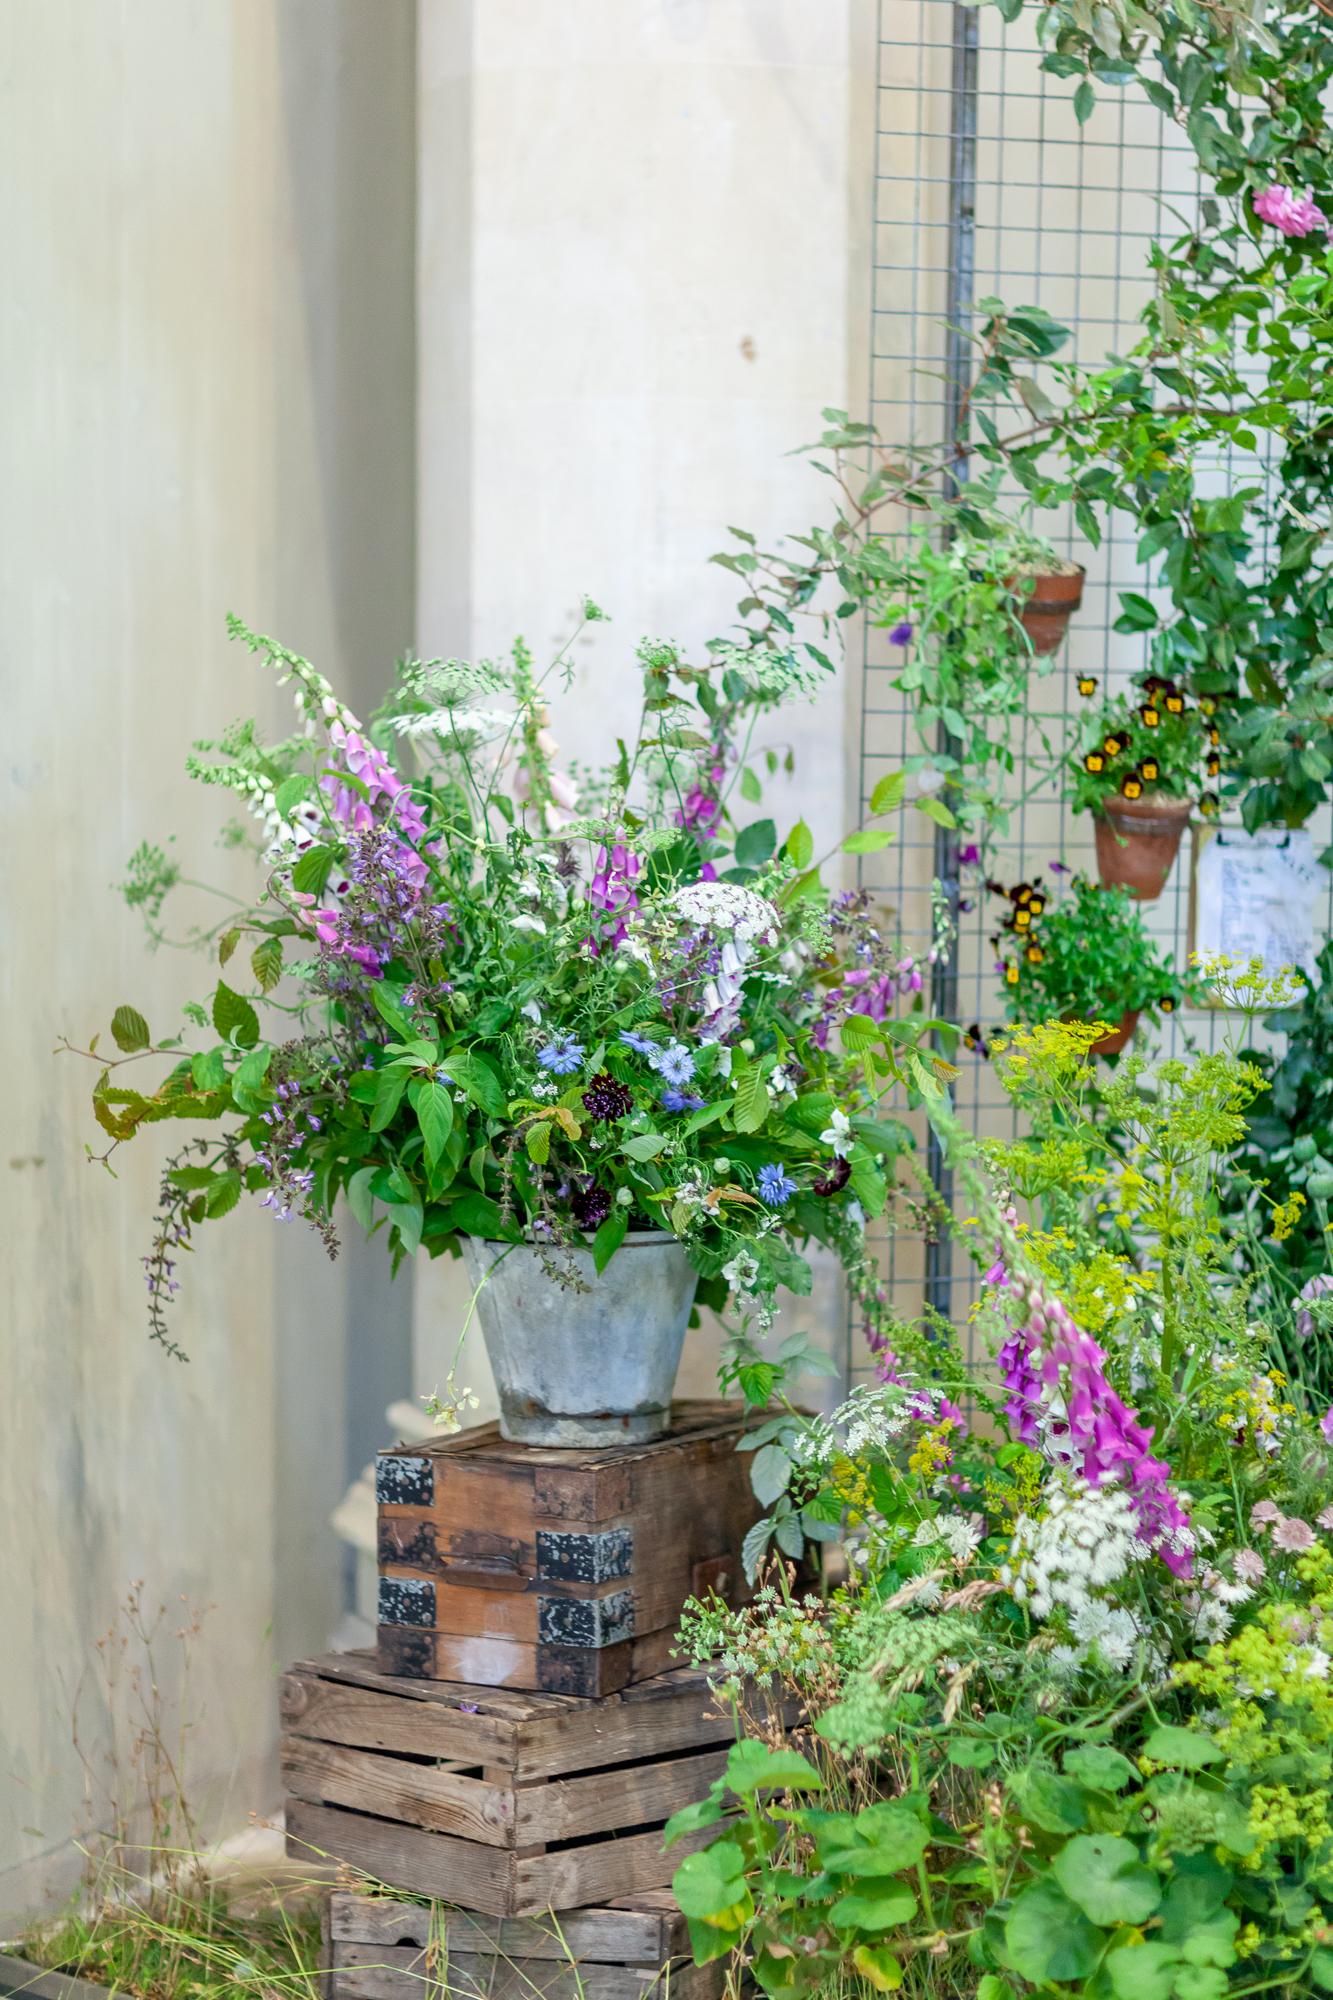 Wolves-Lane-Flower-Company-installation-British-Flowers-Week-2018-at-Garden-Museum-by-New-Covent-Garden-Market (4).jpg